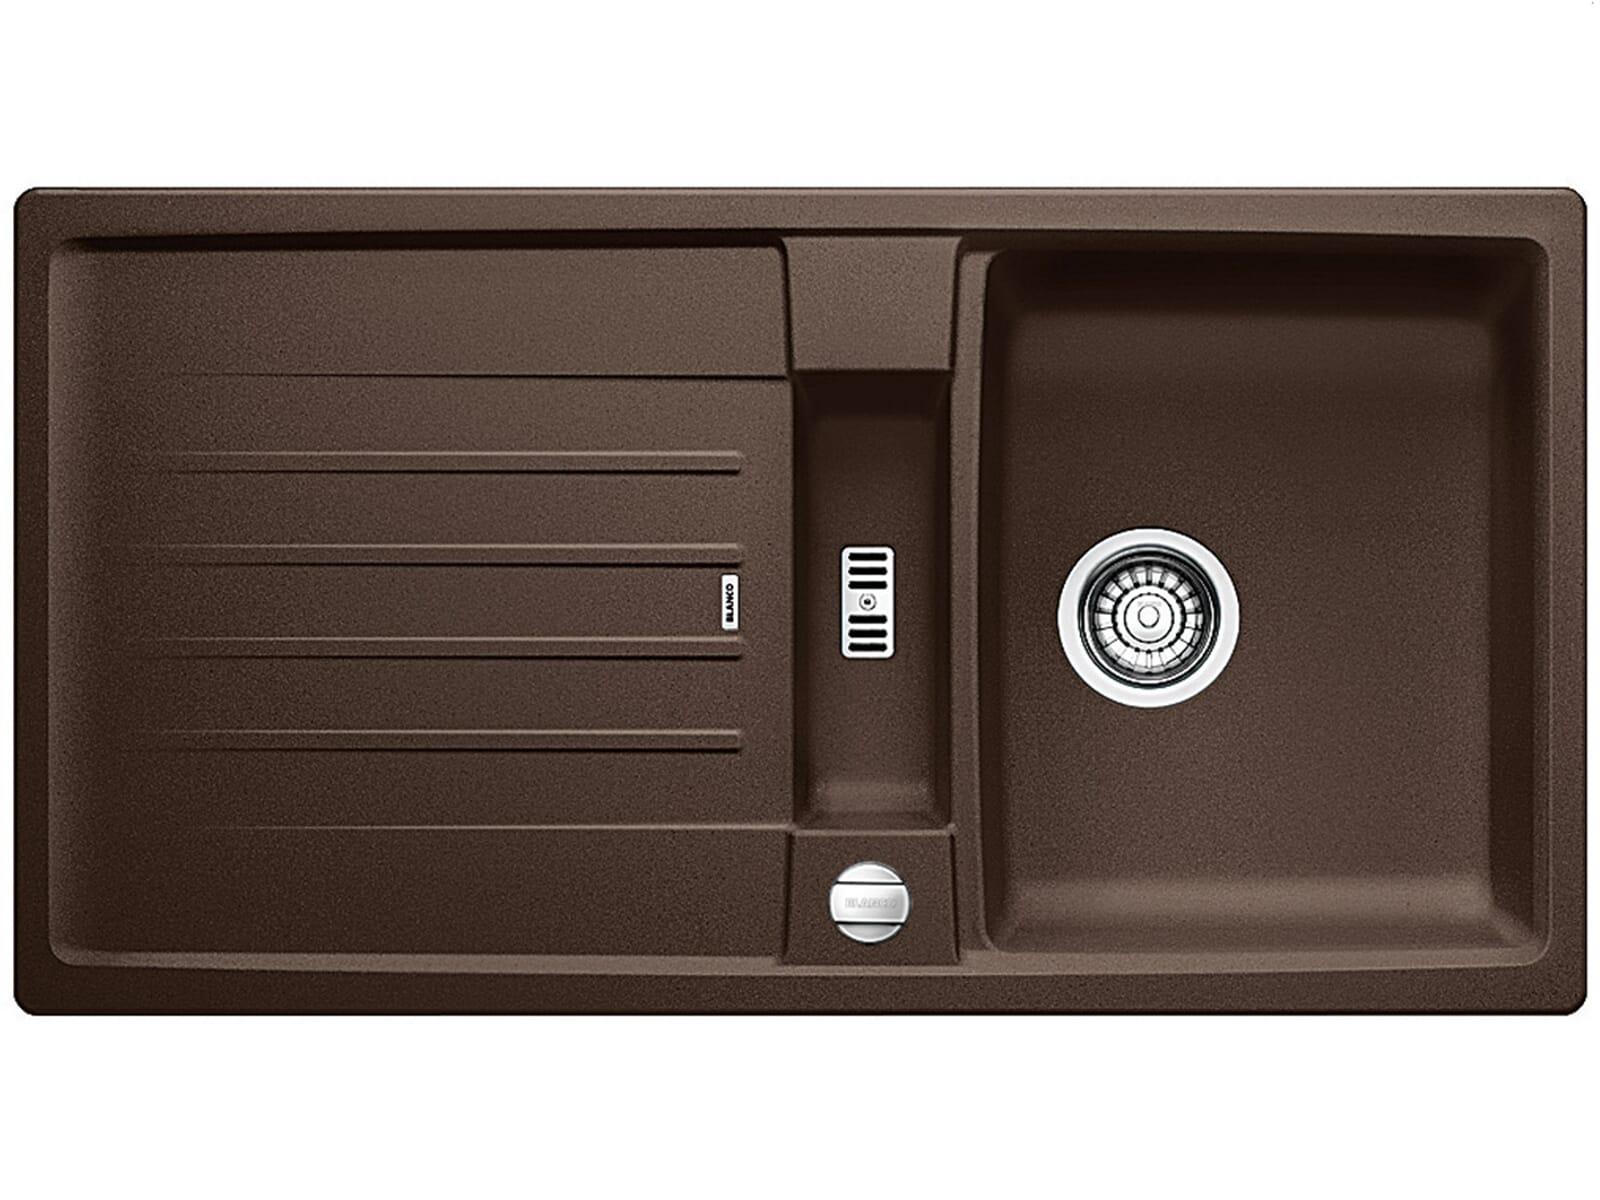 blanco lexa 5 s cafe granit sp le 50er us einbau auflage braun ebay. Black Bedroom Furniture Sets. Home Design Ideas